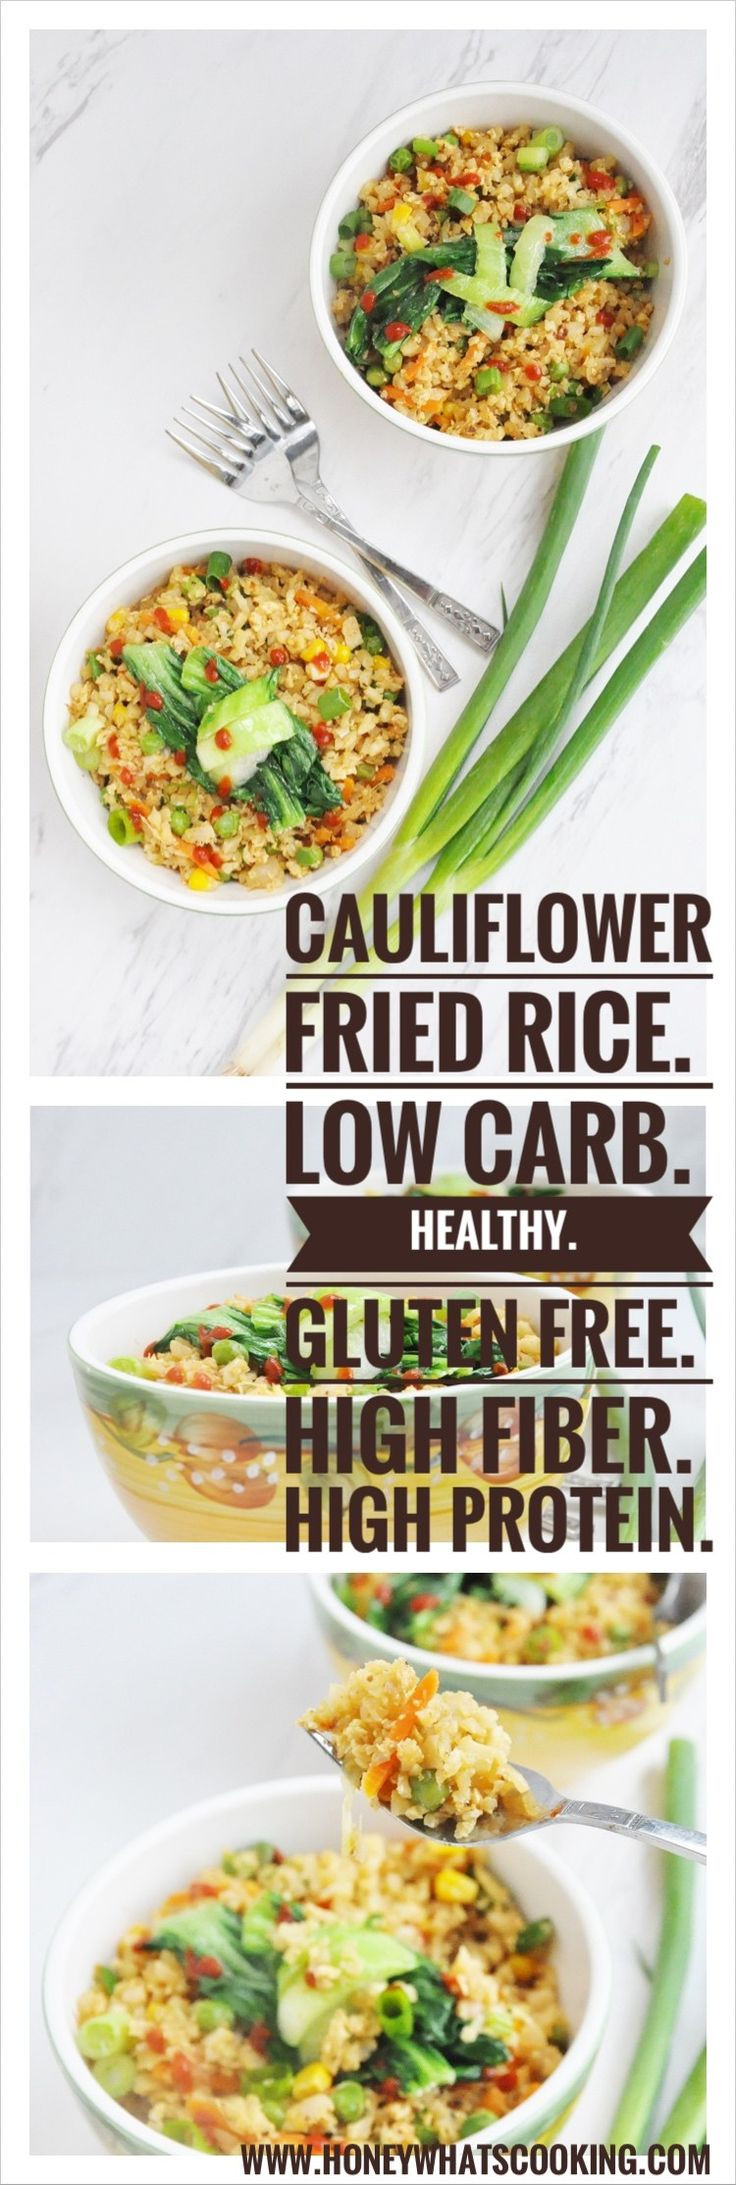 Low Carb High Fiber Recipes  Best 25 High fiber foods ideas on Pinterest